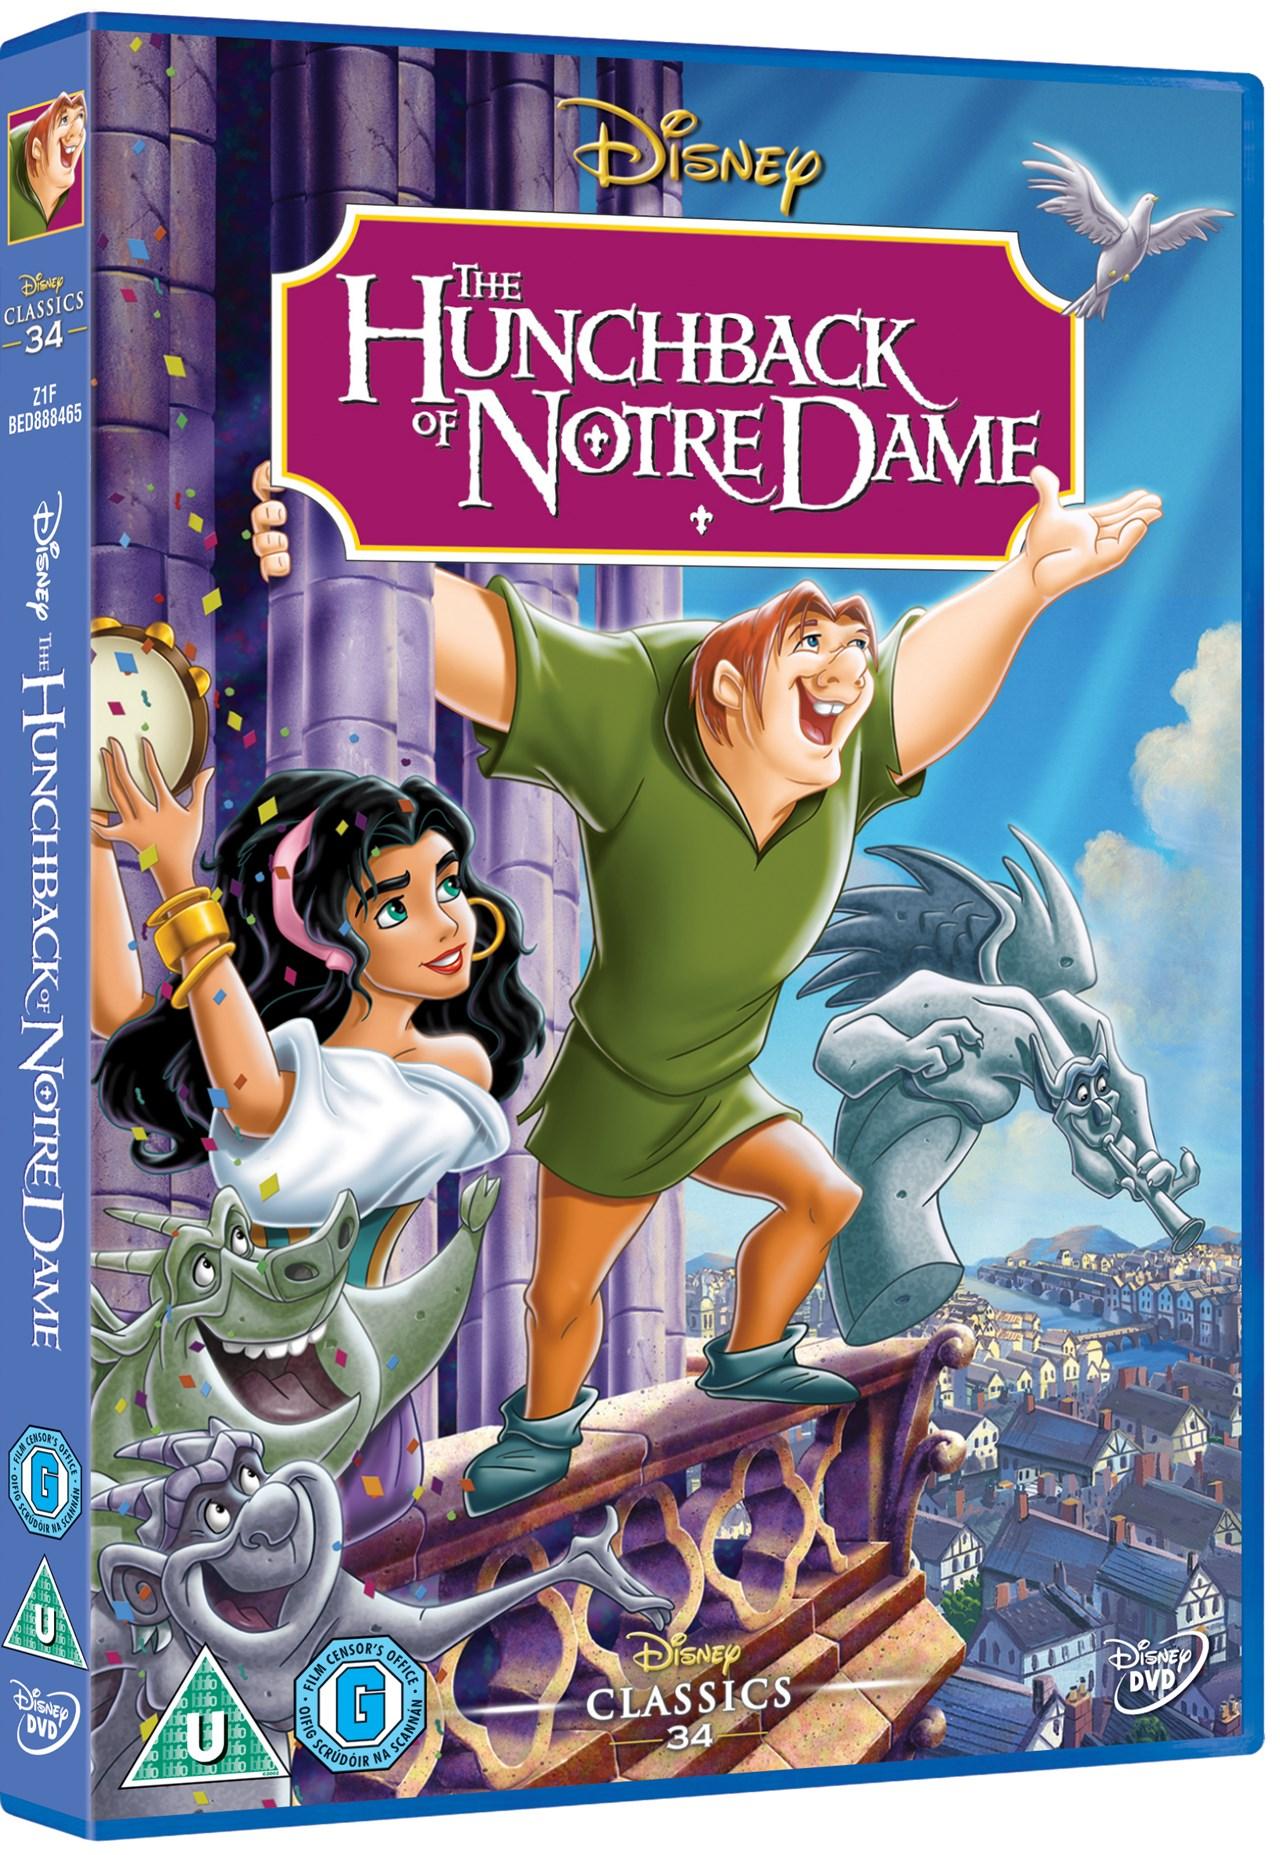 The Hunchback of Notre Dame (Disney) - 4